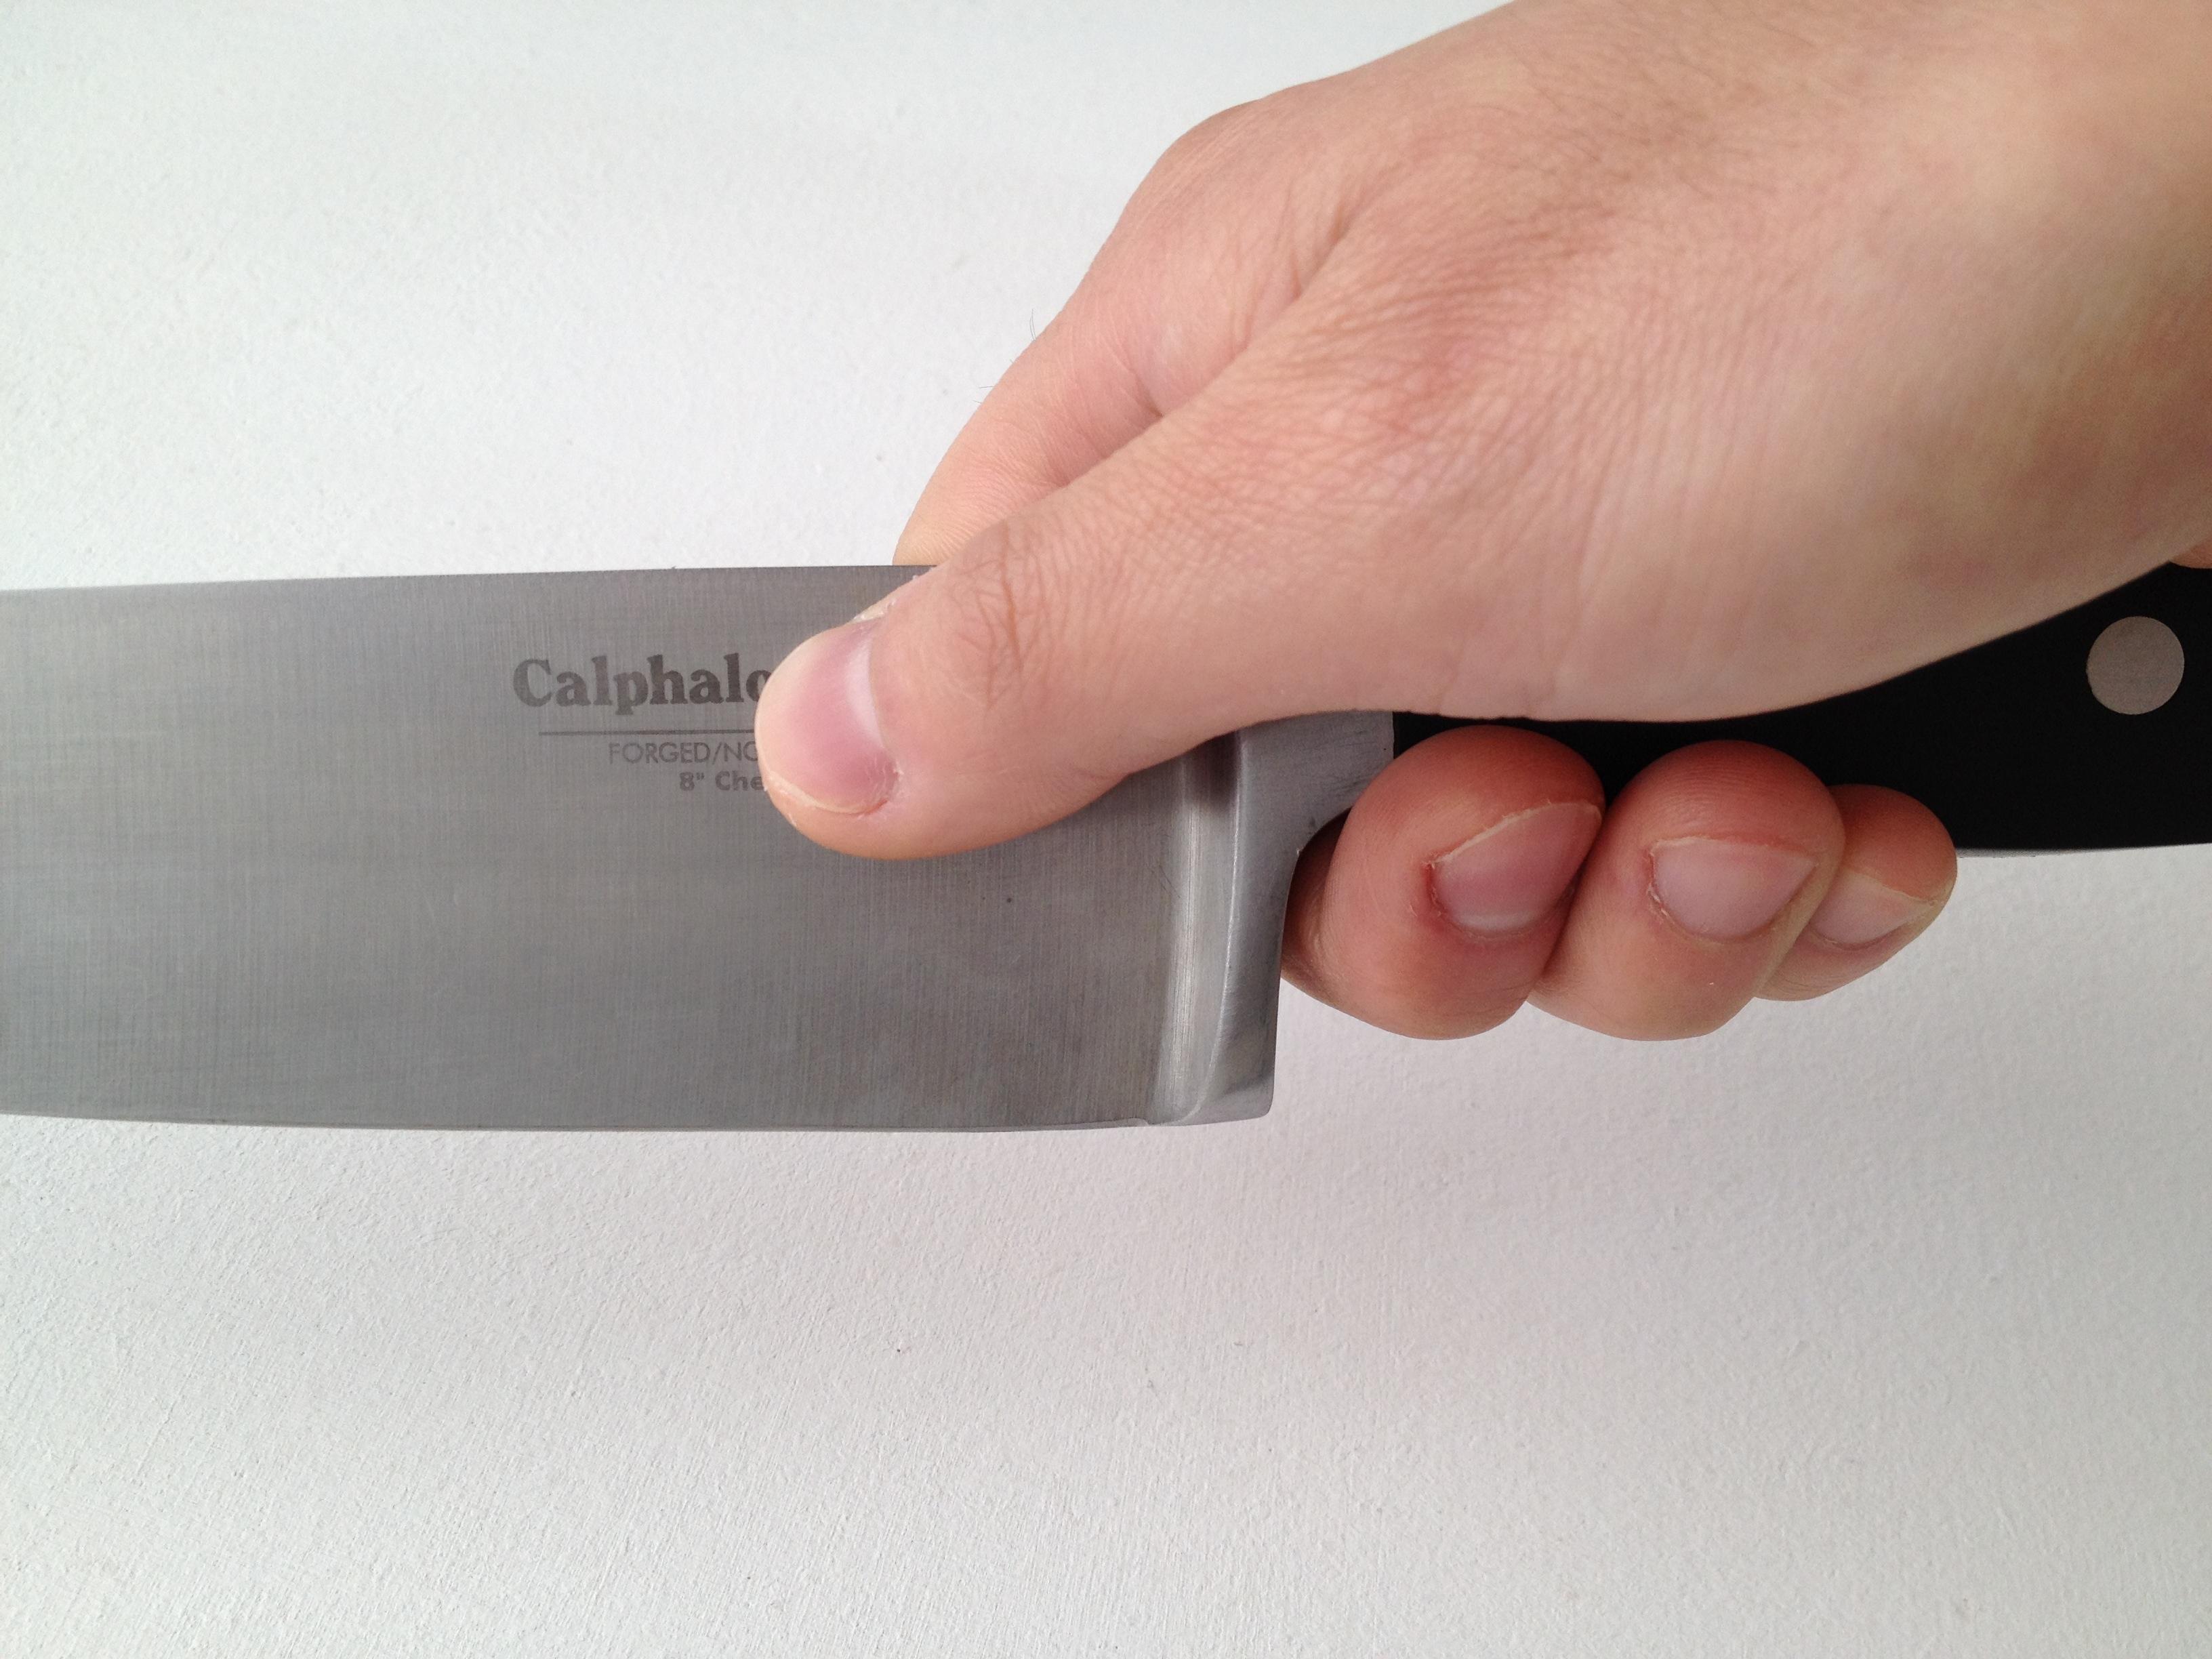 Best Kitchen Knife Reddit